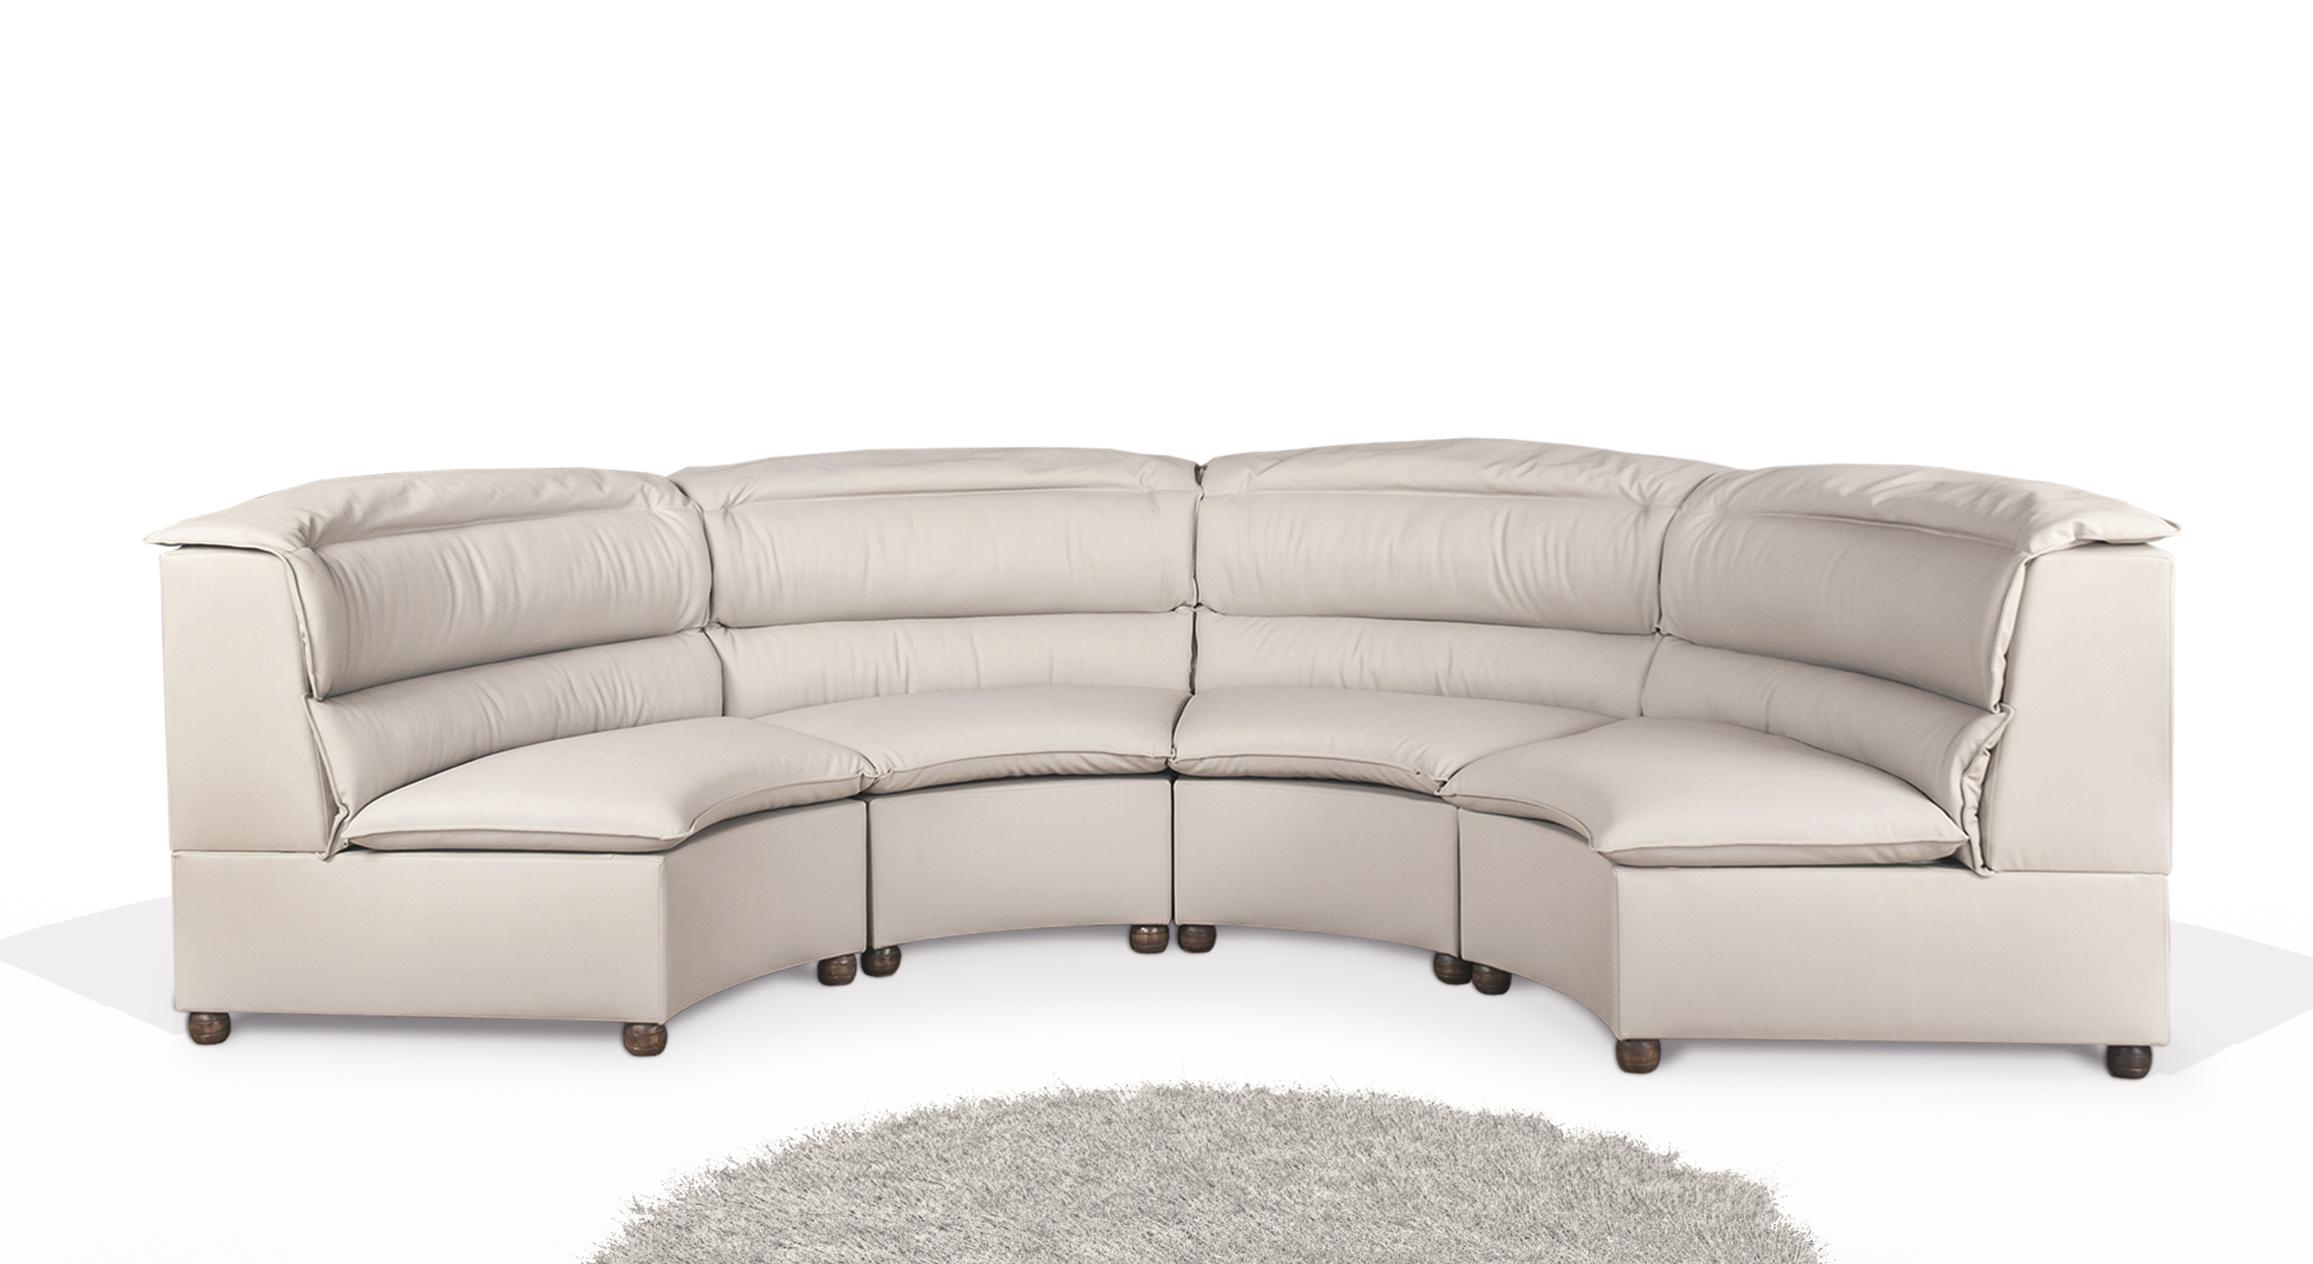 Modular sofa system premier corner sofas by rudi an for Modular sofa